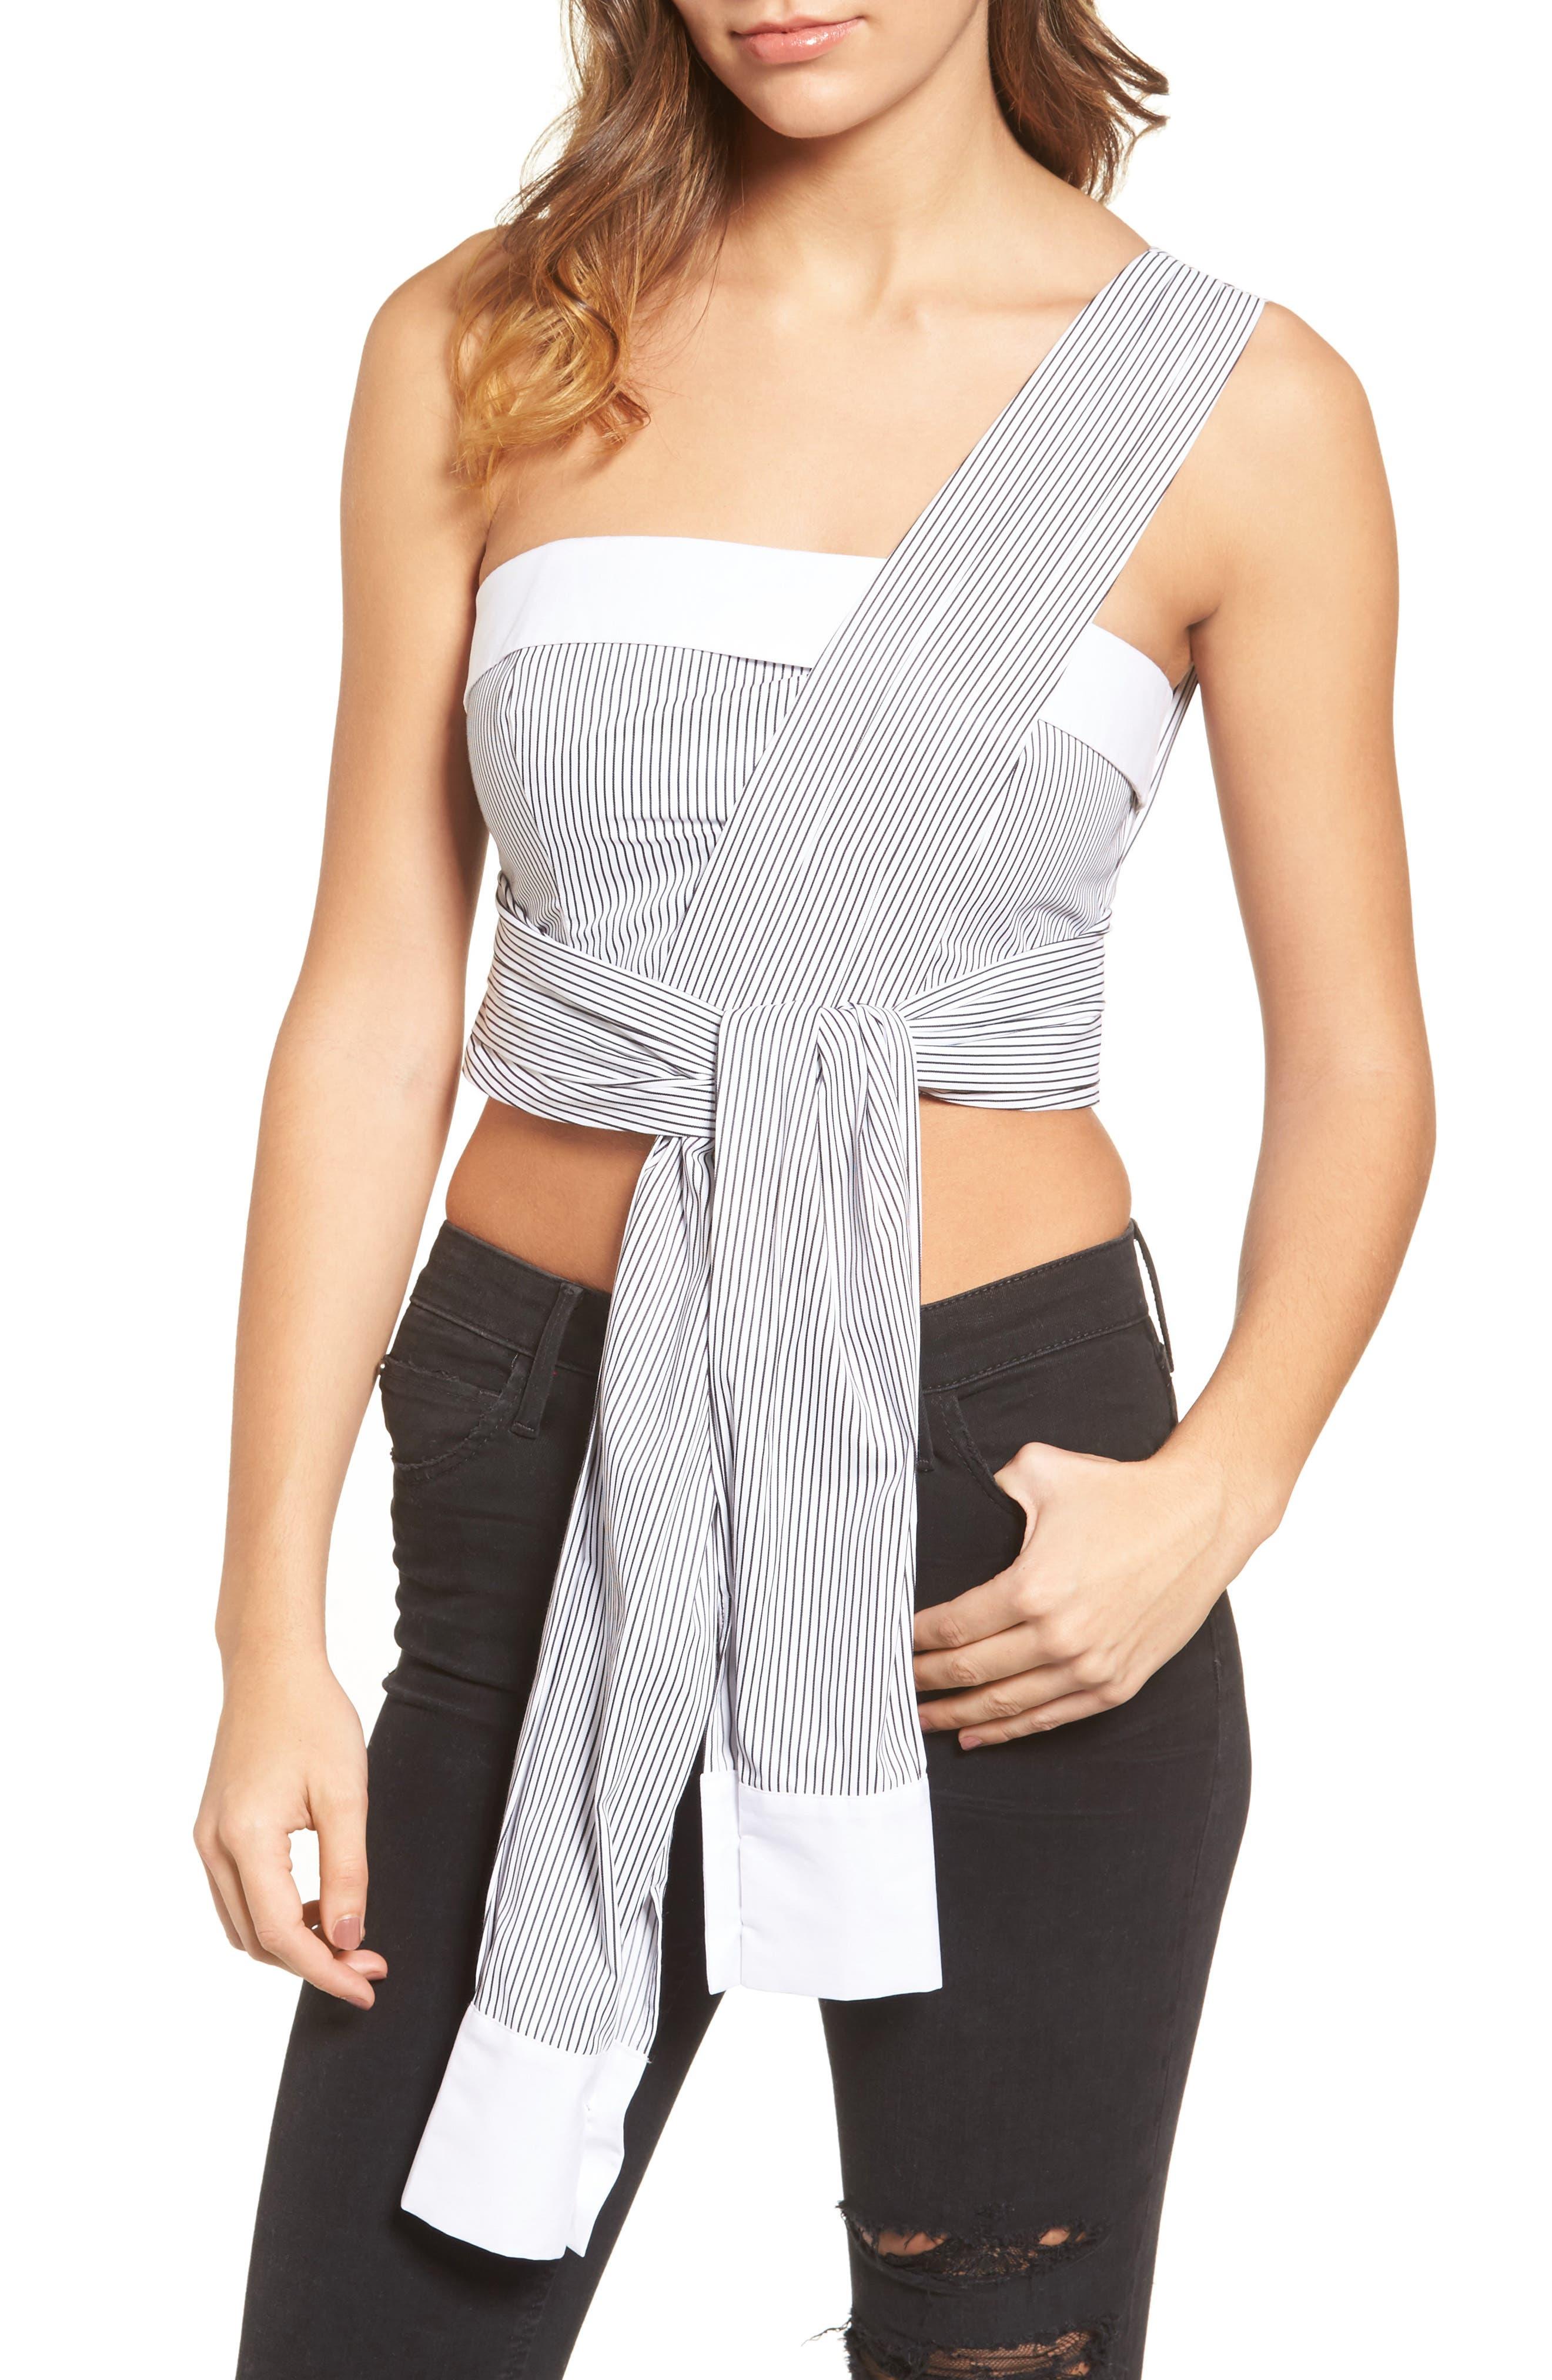 Main Image - KENDALL + KYLIE Sleeve Wrap Crop Top